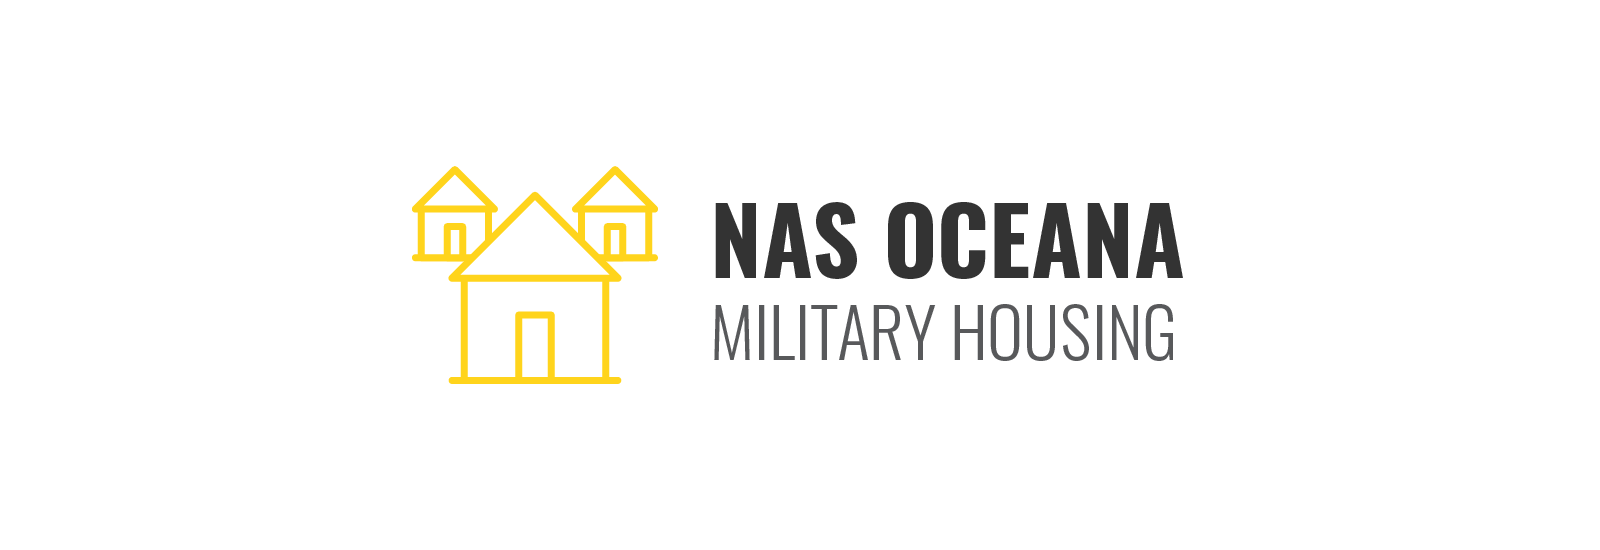 NAS Oceana Military Housing